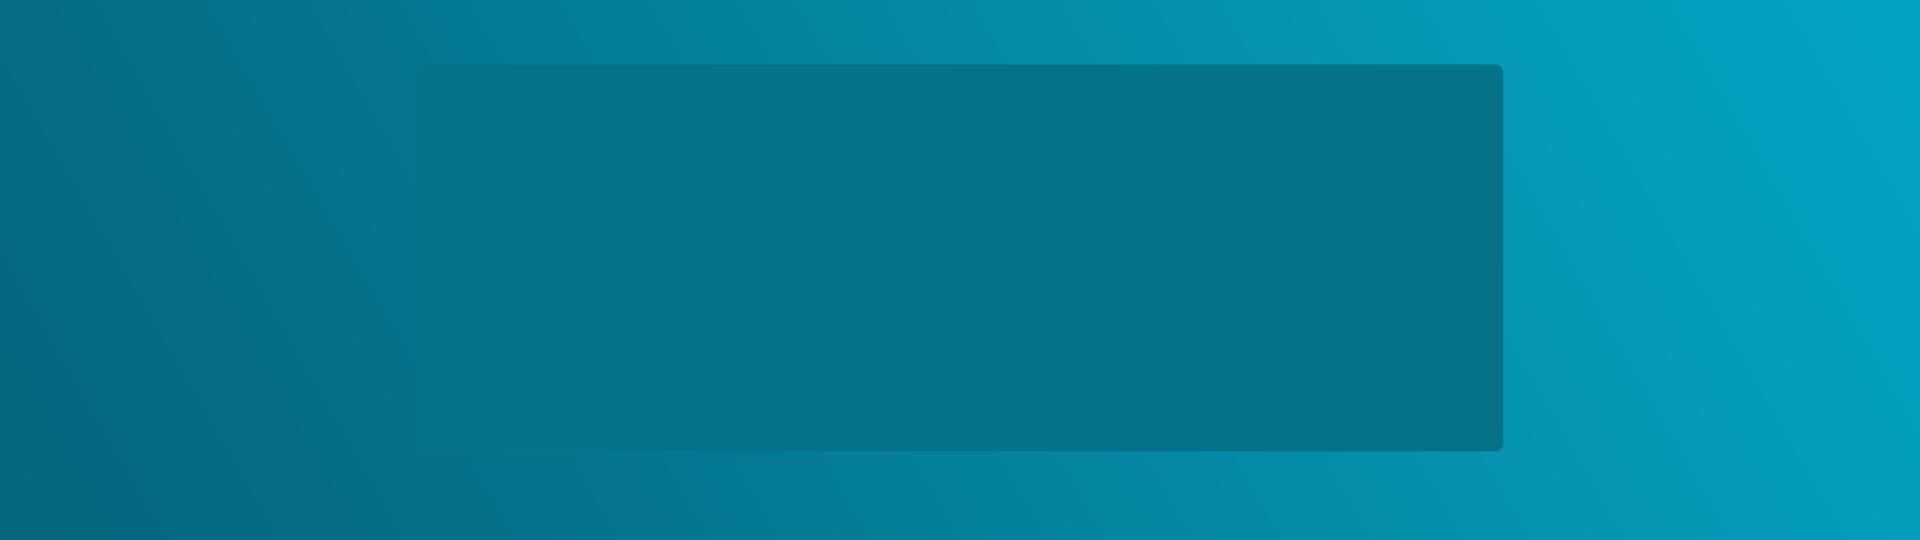 CATEGORY-TEL-SAMSUNGCEPTELEFONLARI-03-01